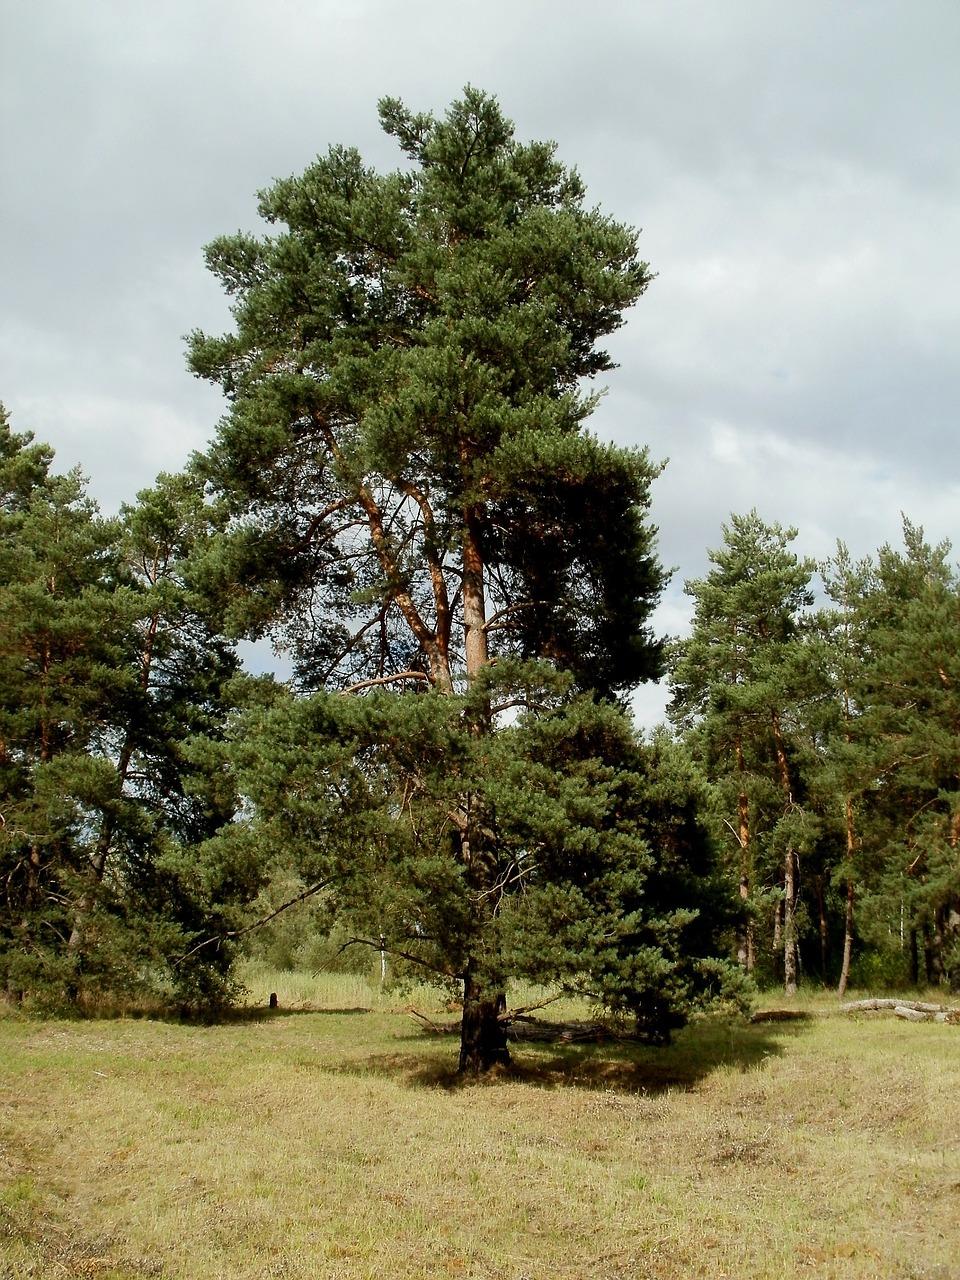 Pinus sylvestris - Vliegden  Hoogte: 10 - 30 m  Kleur: Niet van toepassing  Wintergroen: Ja  Bloeiperiode: Niet van toepassing